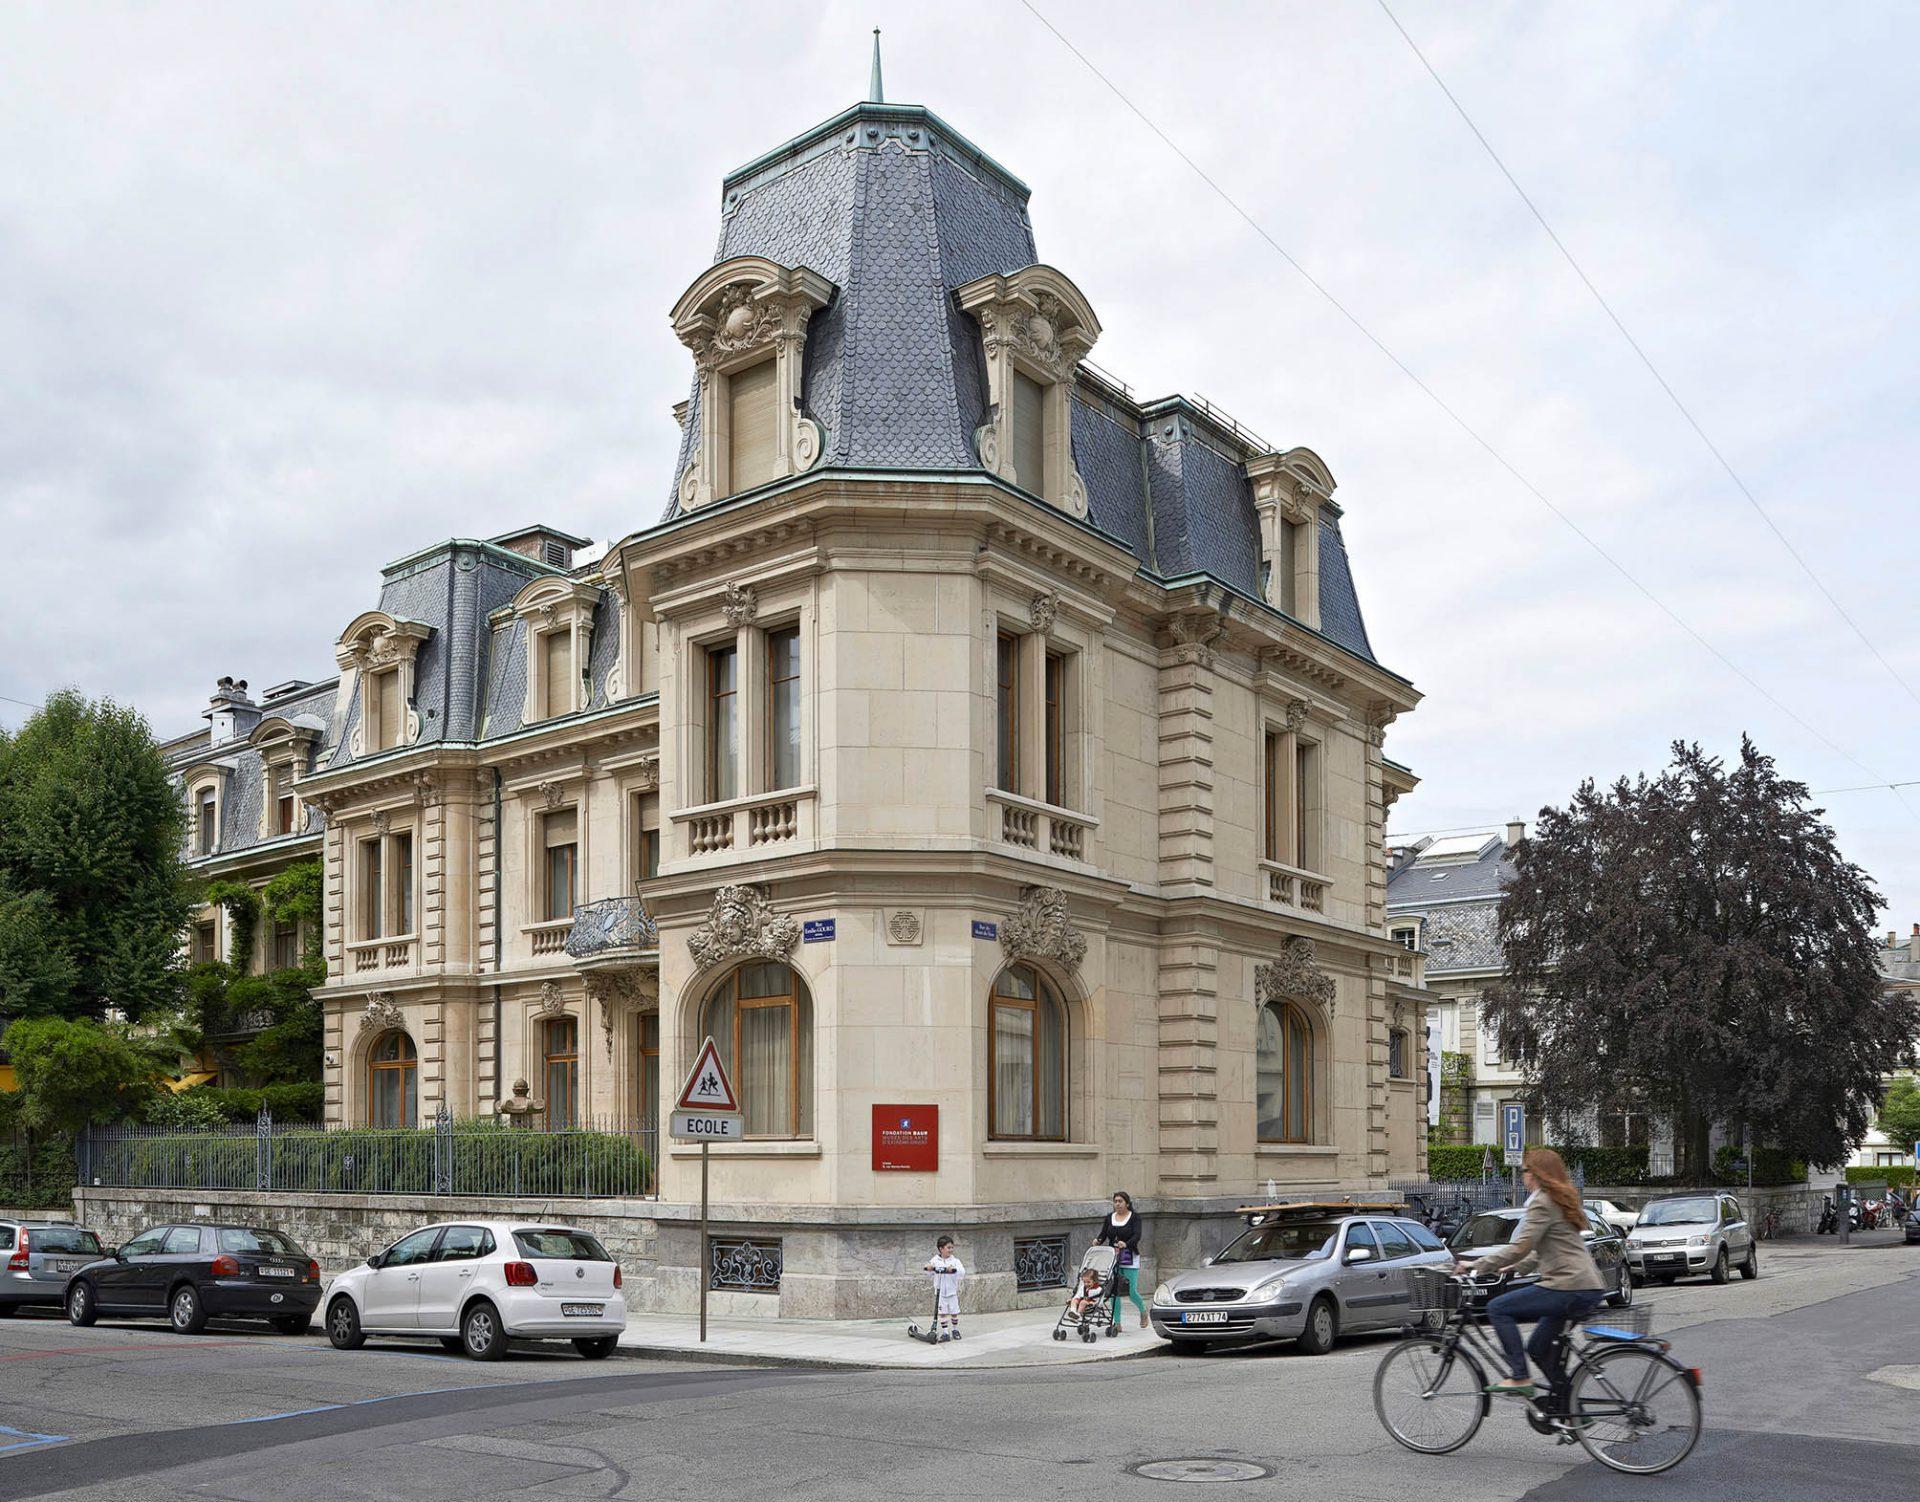 Façade du Musée Baur